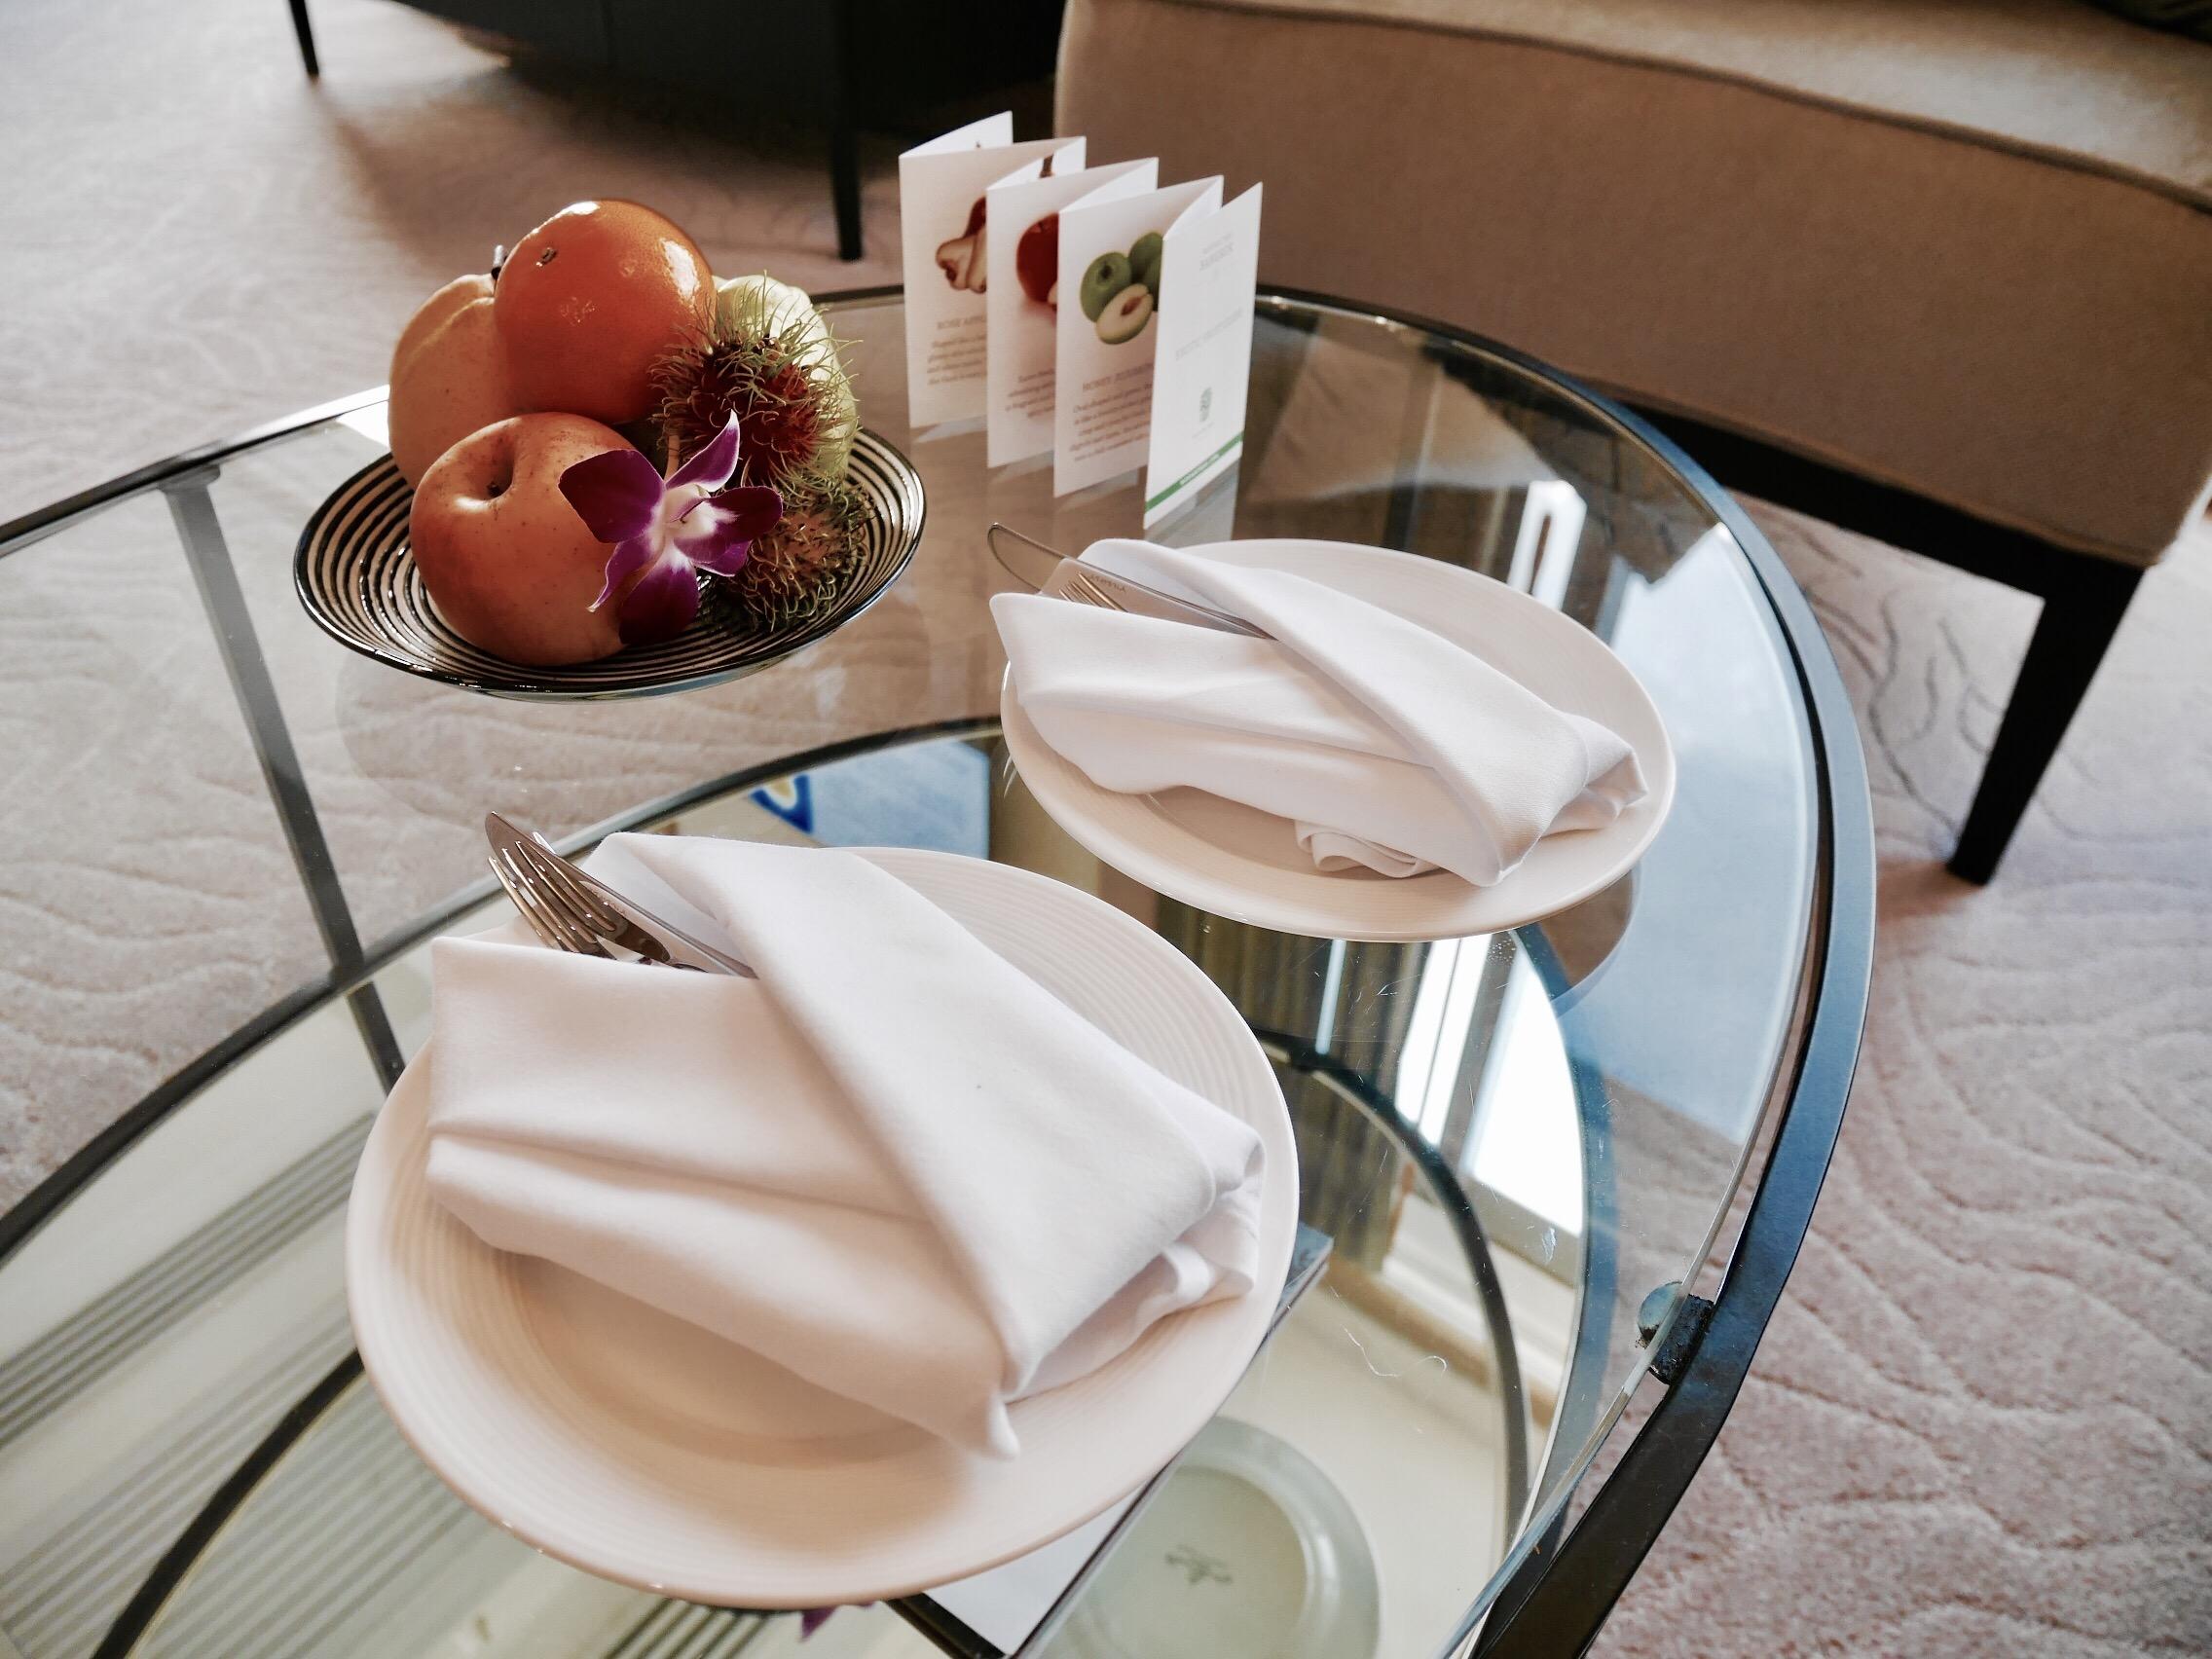 img 8212 - Banyan Tree Bangkok - 五つ星ホテルバンヤンツリーのSERENITY CLUBで過ごすリュクスな時間 「客室編」